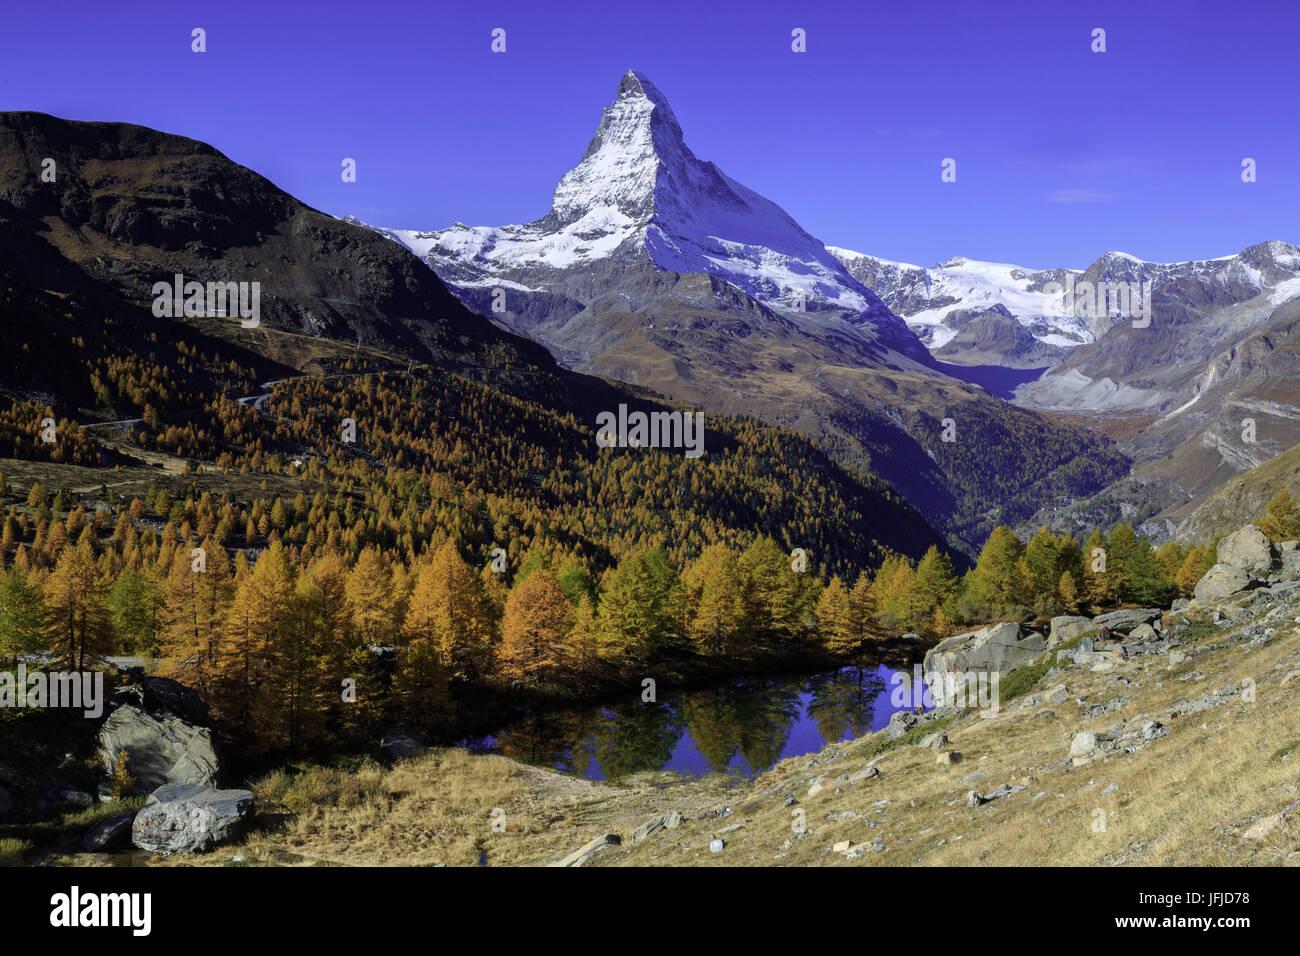 Matterhorn and Grindjisee lake in Autumn, Zermatt, Switzerland, europe Stock Photo